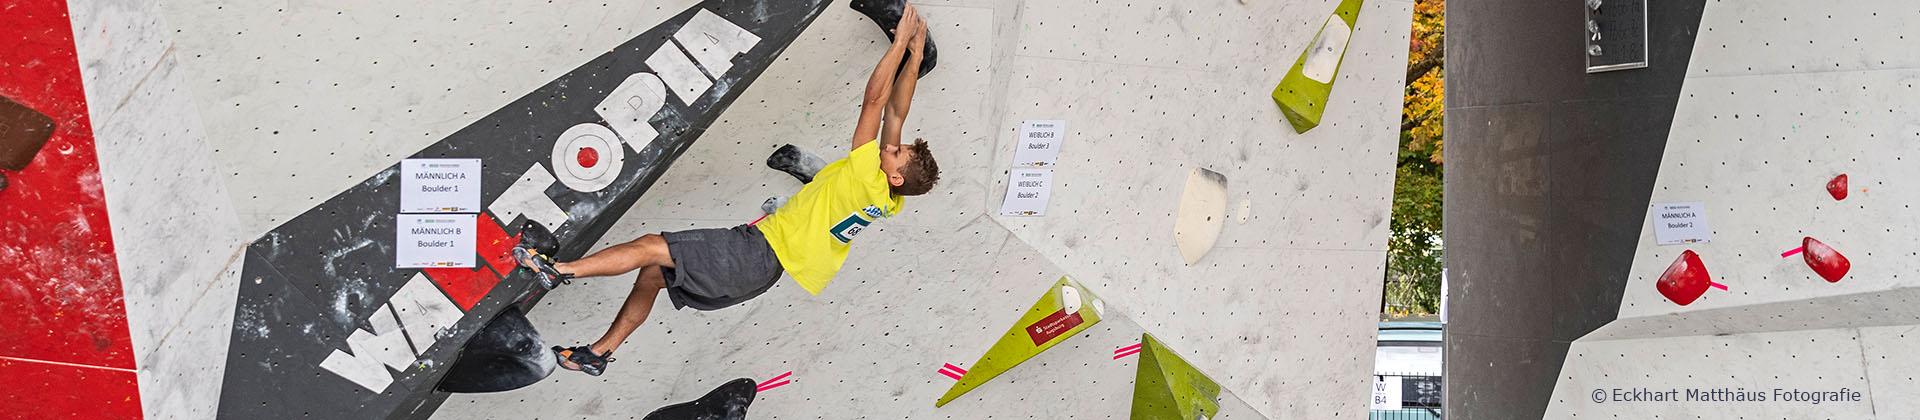 Wettkampf-Bouldern-Junge